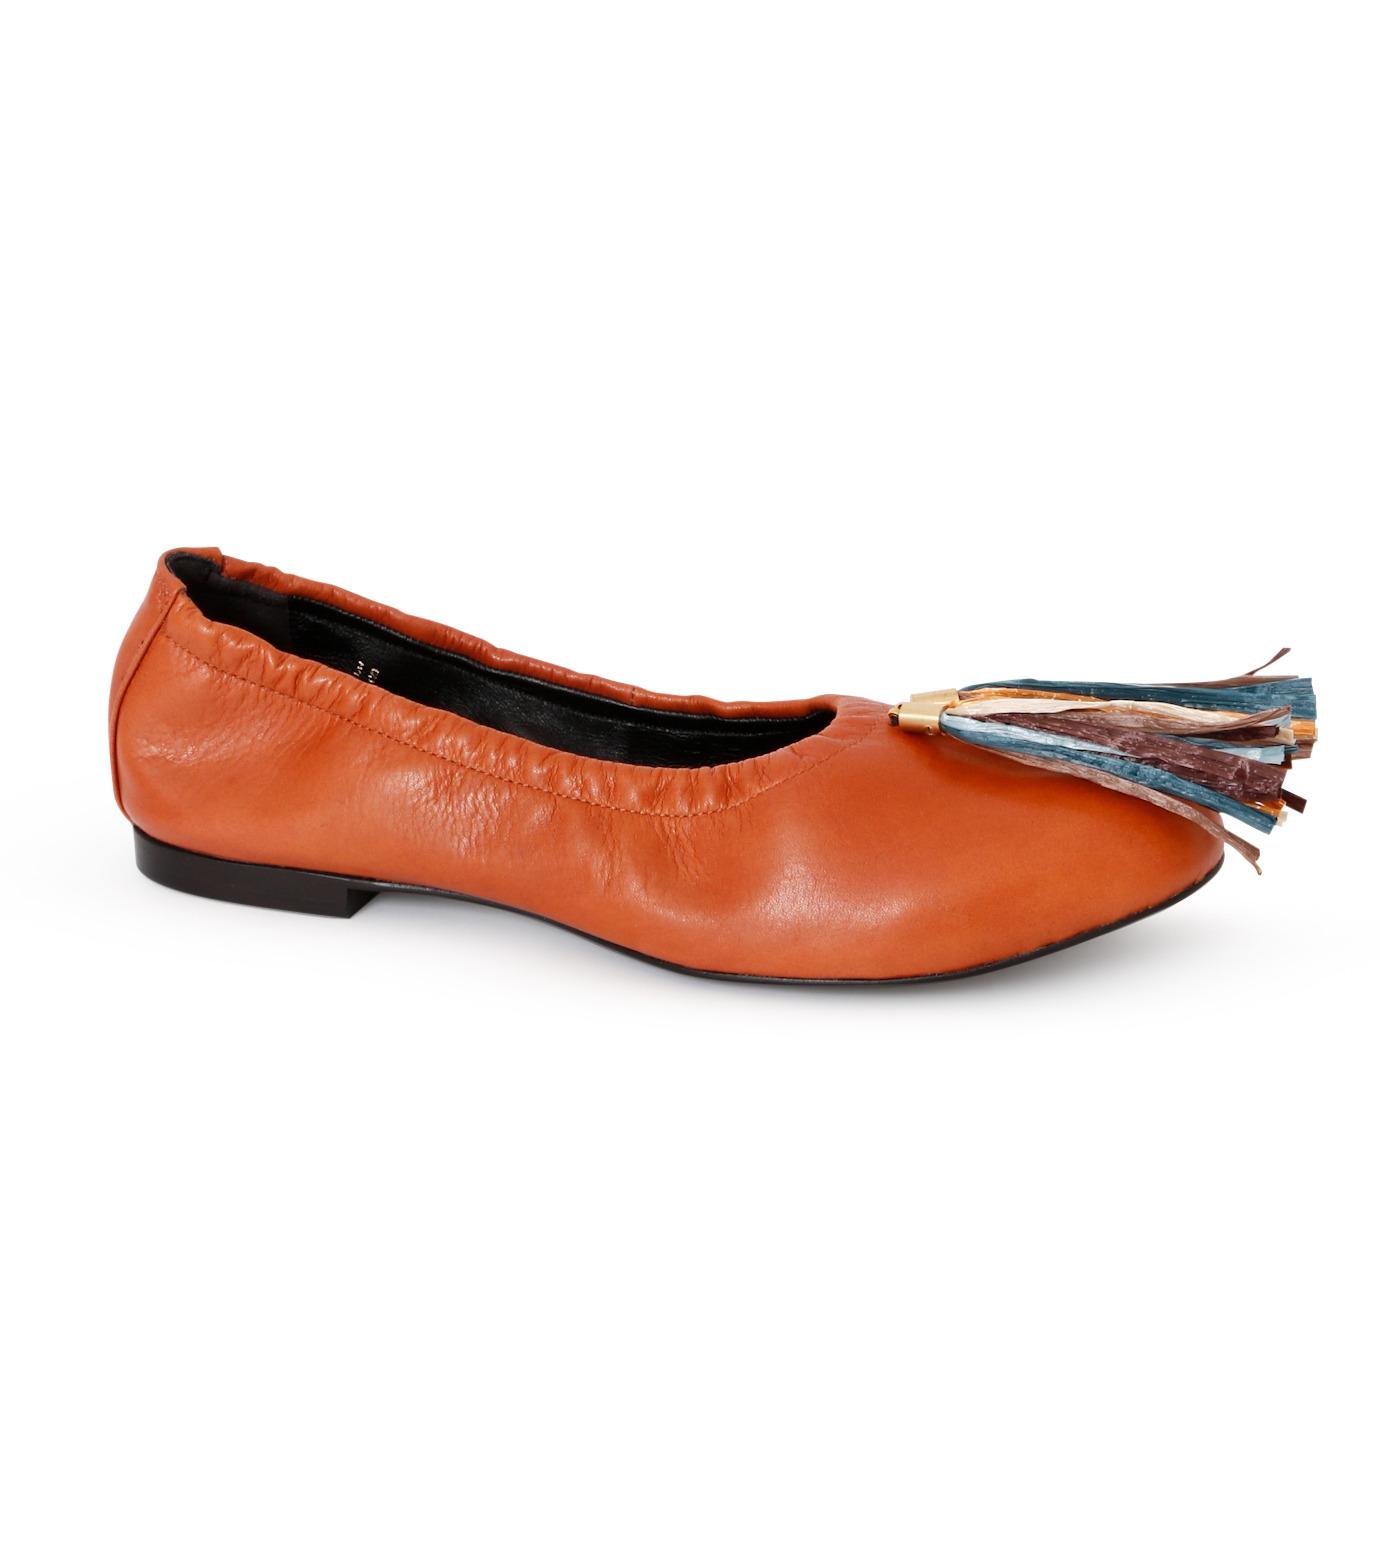 PIPPICHIC(ピッピシック)のballet shoes-DARK BROWN(シューズ/shoes)-PP16BALLET19-43 拡大詳細画像1